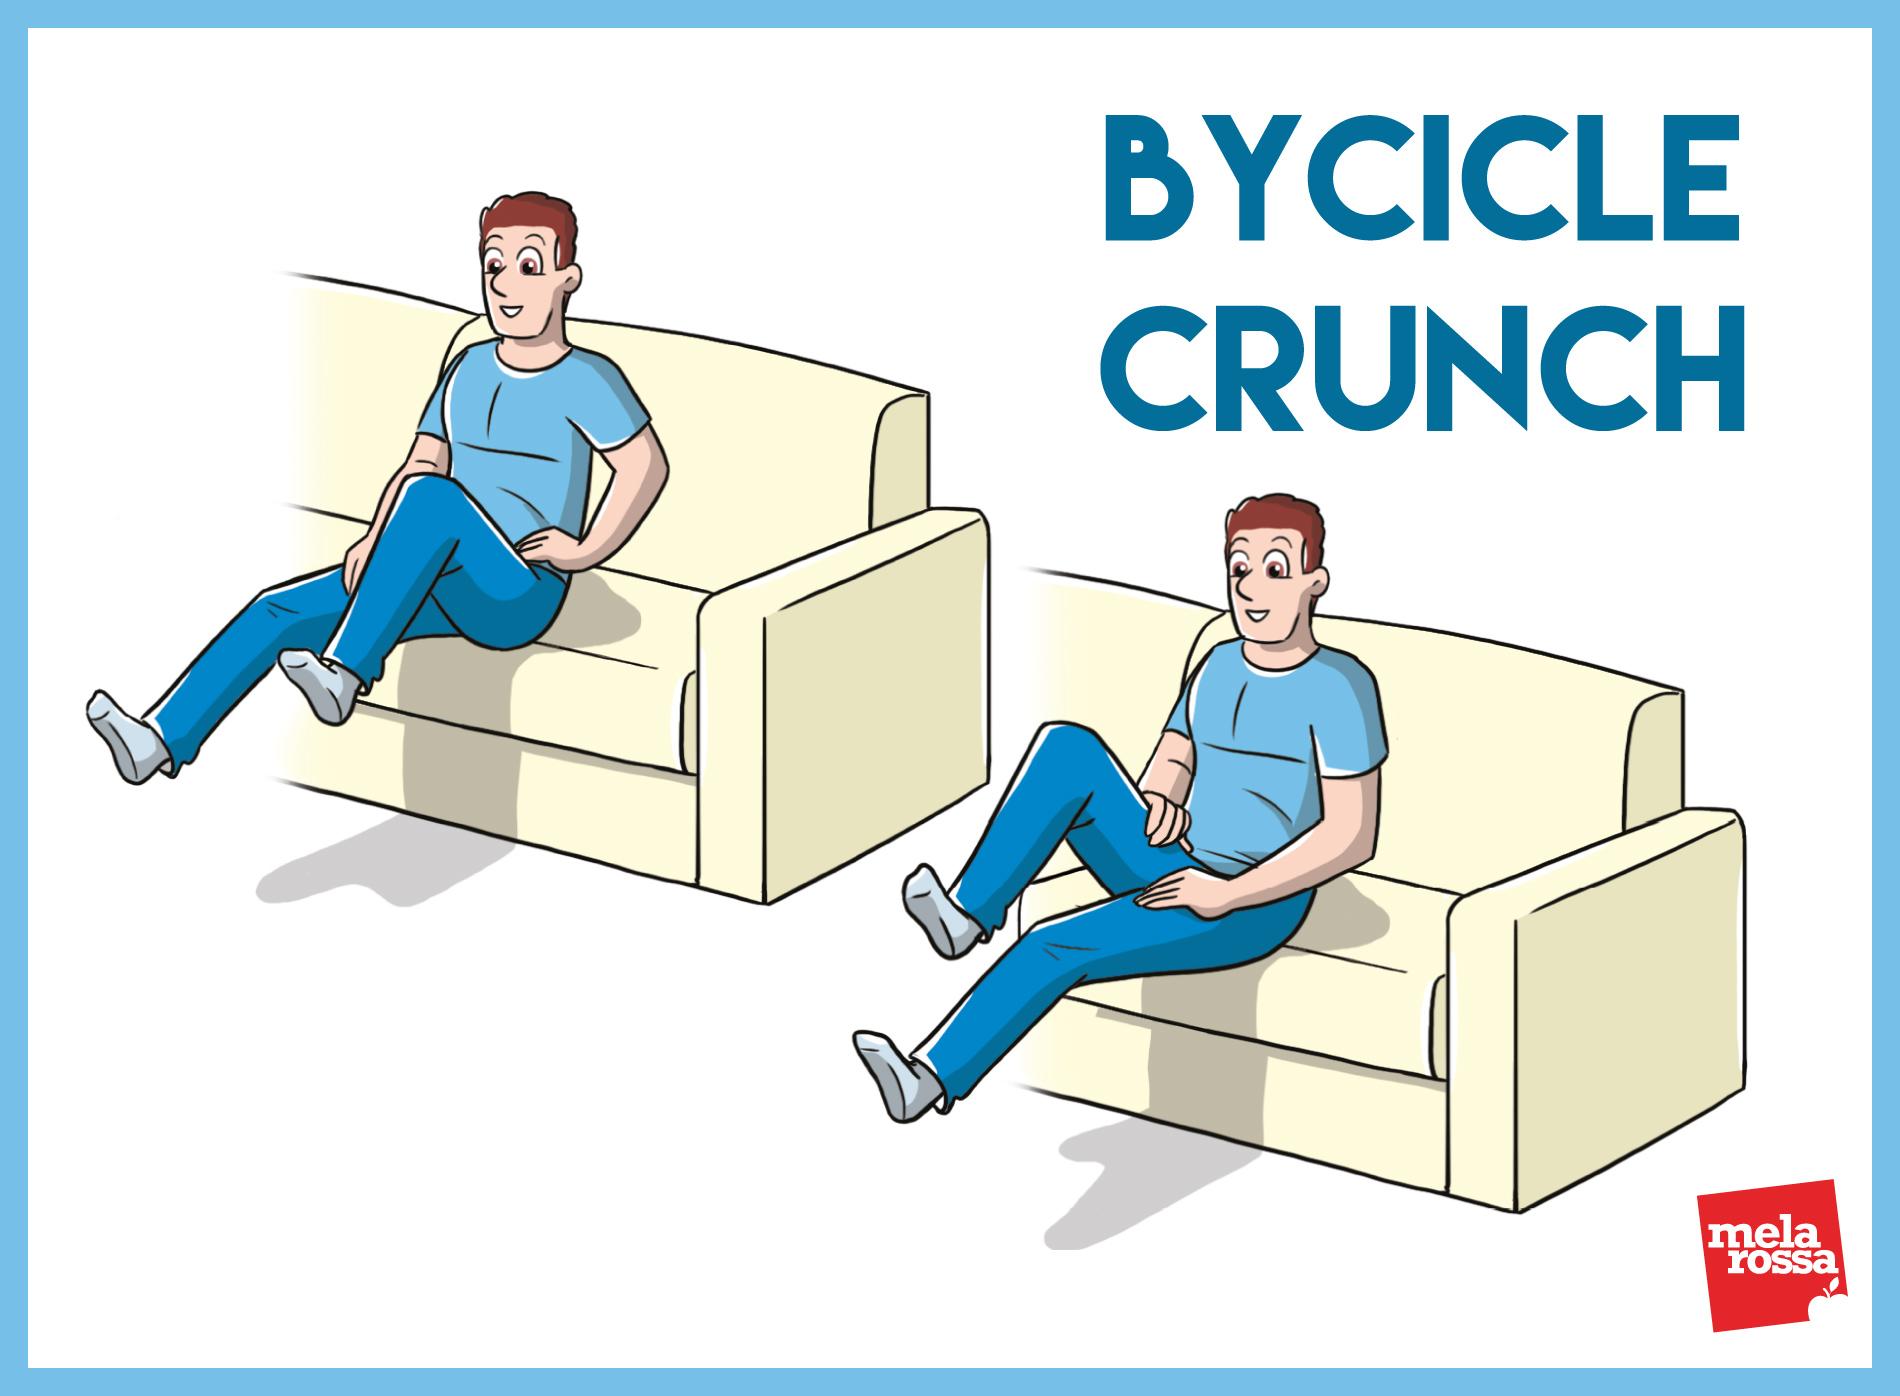 ginnastica da divano: workout da fare a Natale